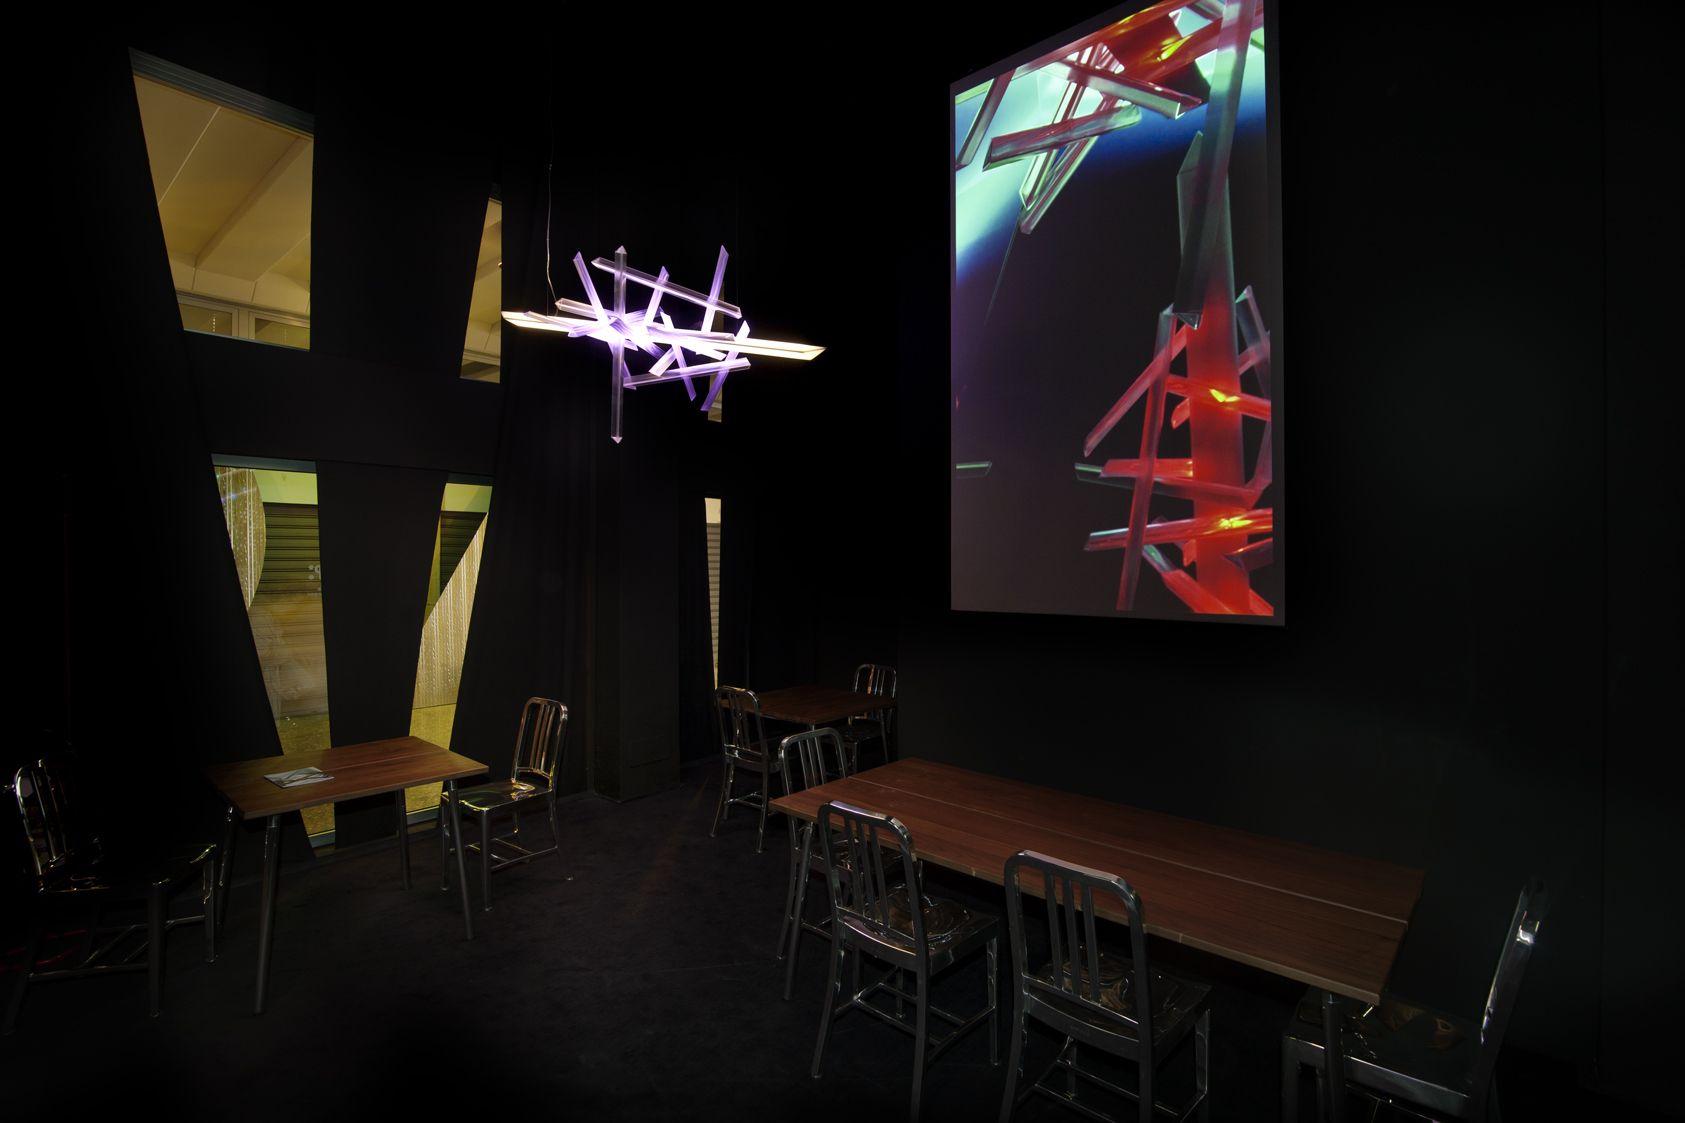 avant garde lighting. \u201cLa # Traviata \u201d, The New Avant-garde Light Sculpture Avant Garde Lighting